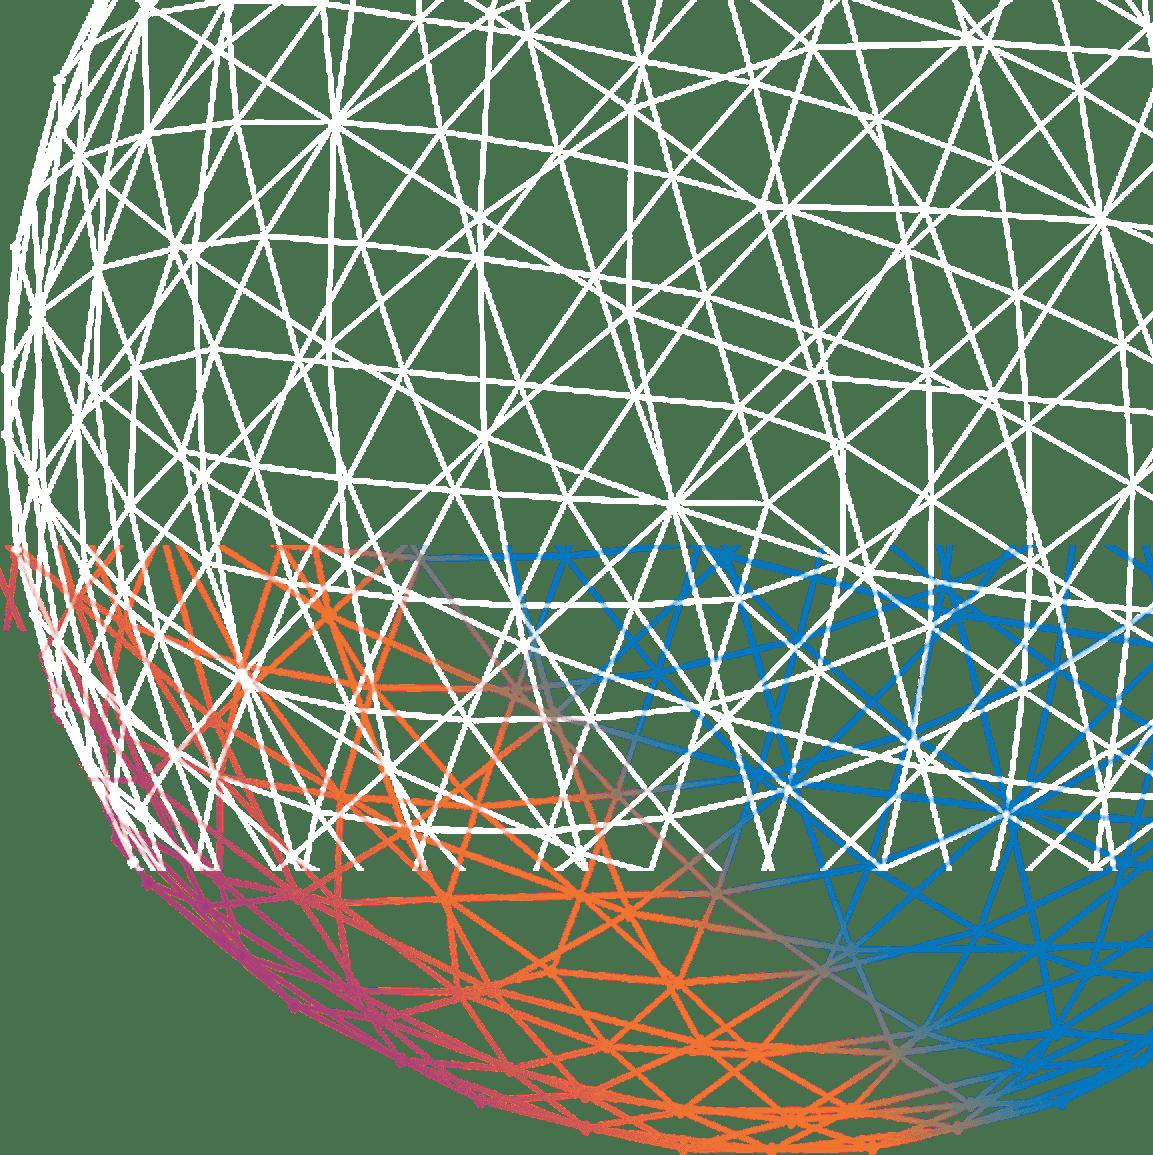 Sphere@2x